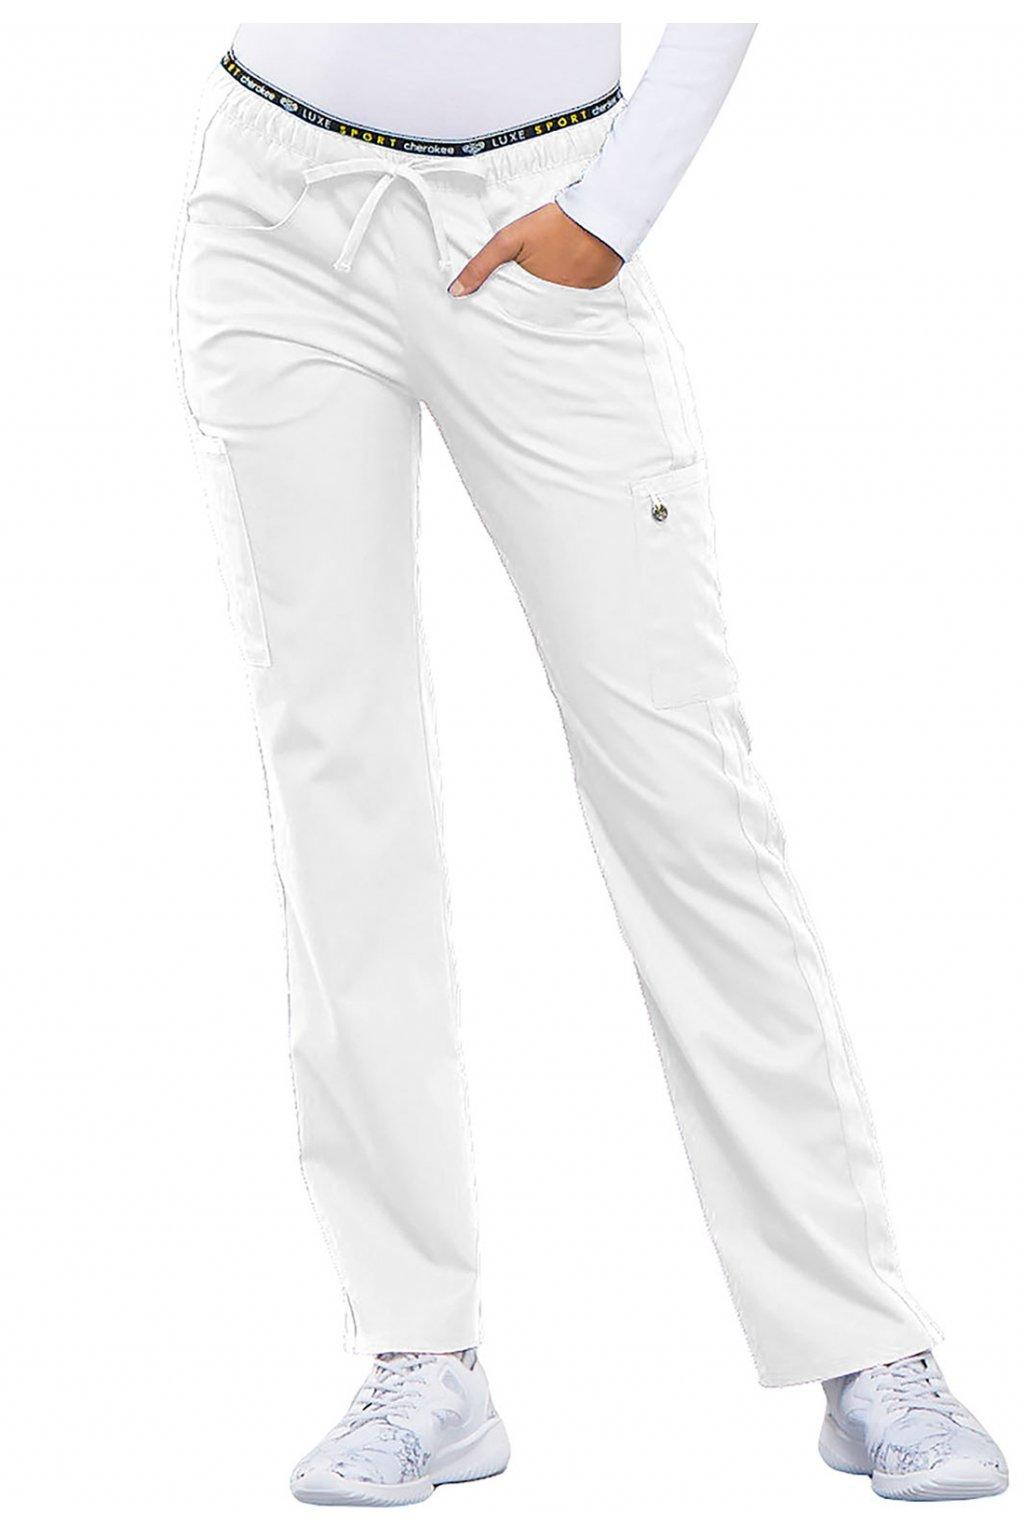 zdravotnicke-kalhoty-cherokee-luxe-ck003-01